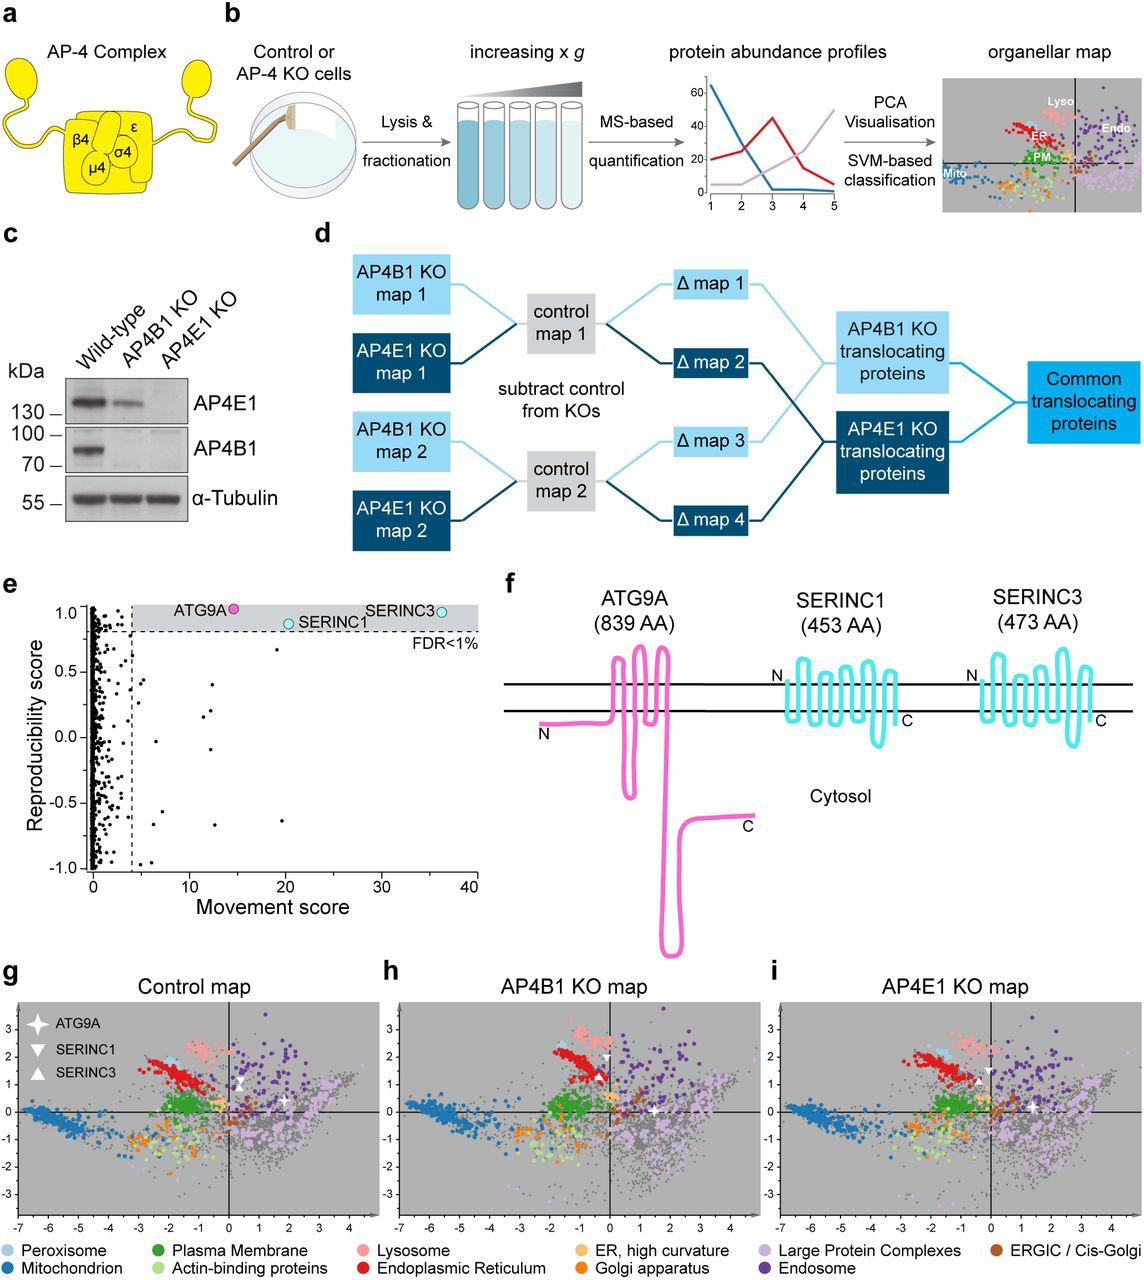 AP-4 vesicles contribute to spatial control of autophagy via